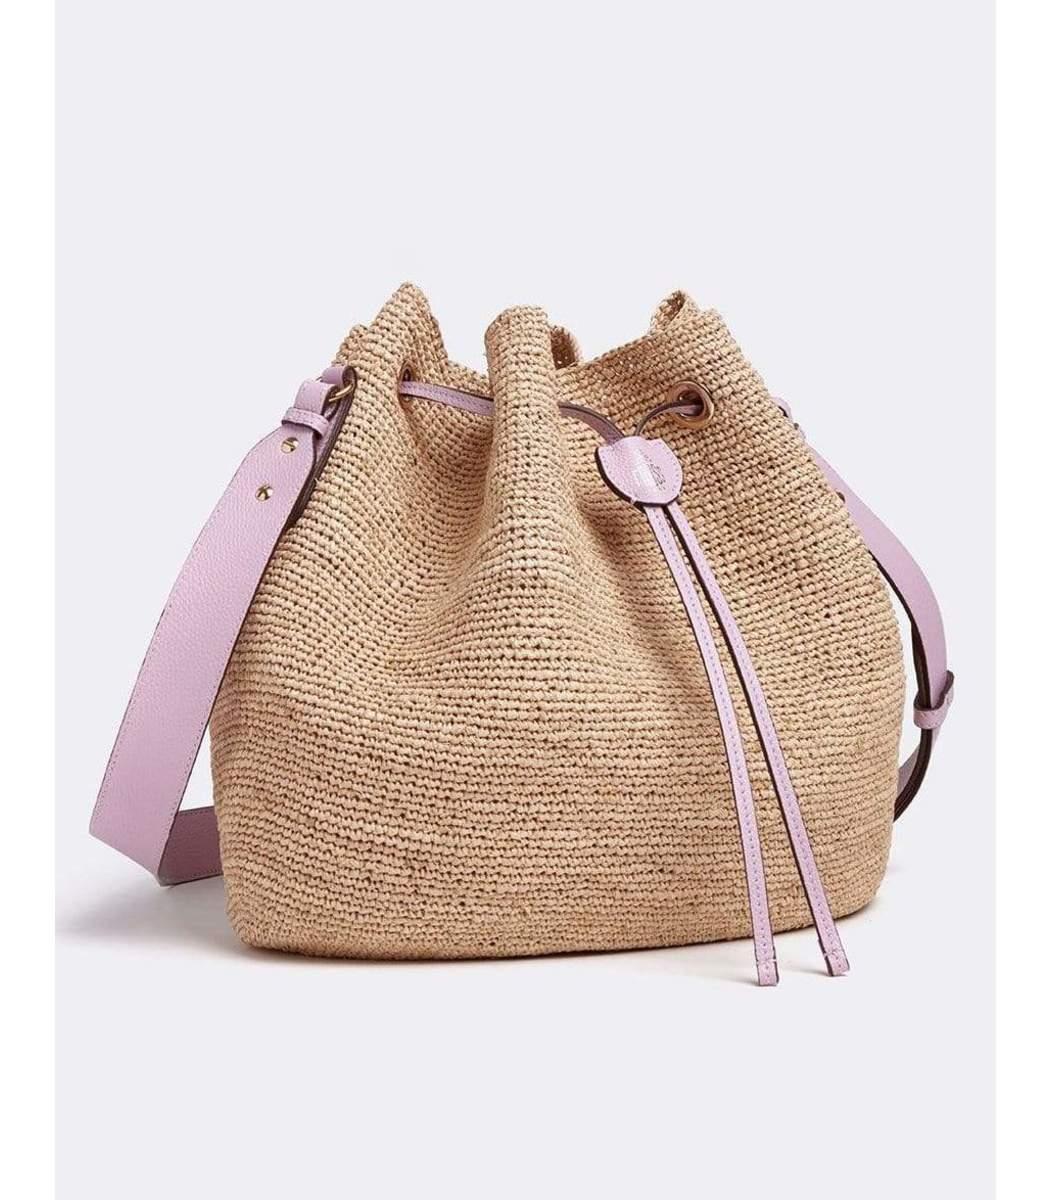 Mark Cross Leathers Joni Raffia & Leather Bucket Bag - Tumbled Grain Lilac